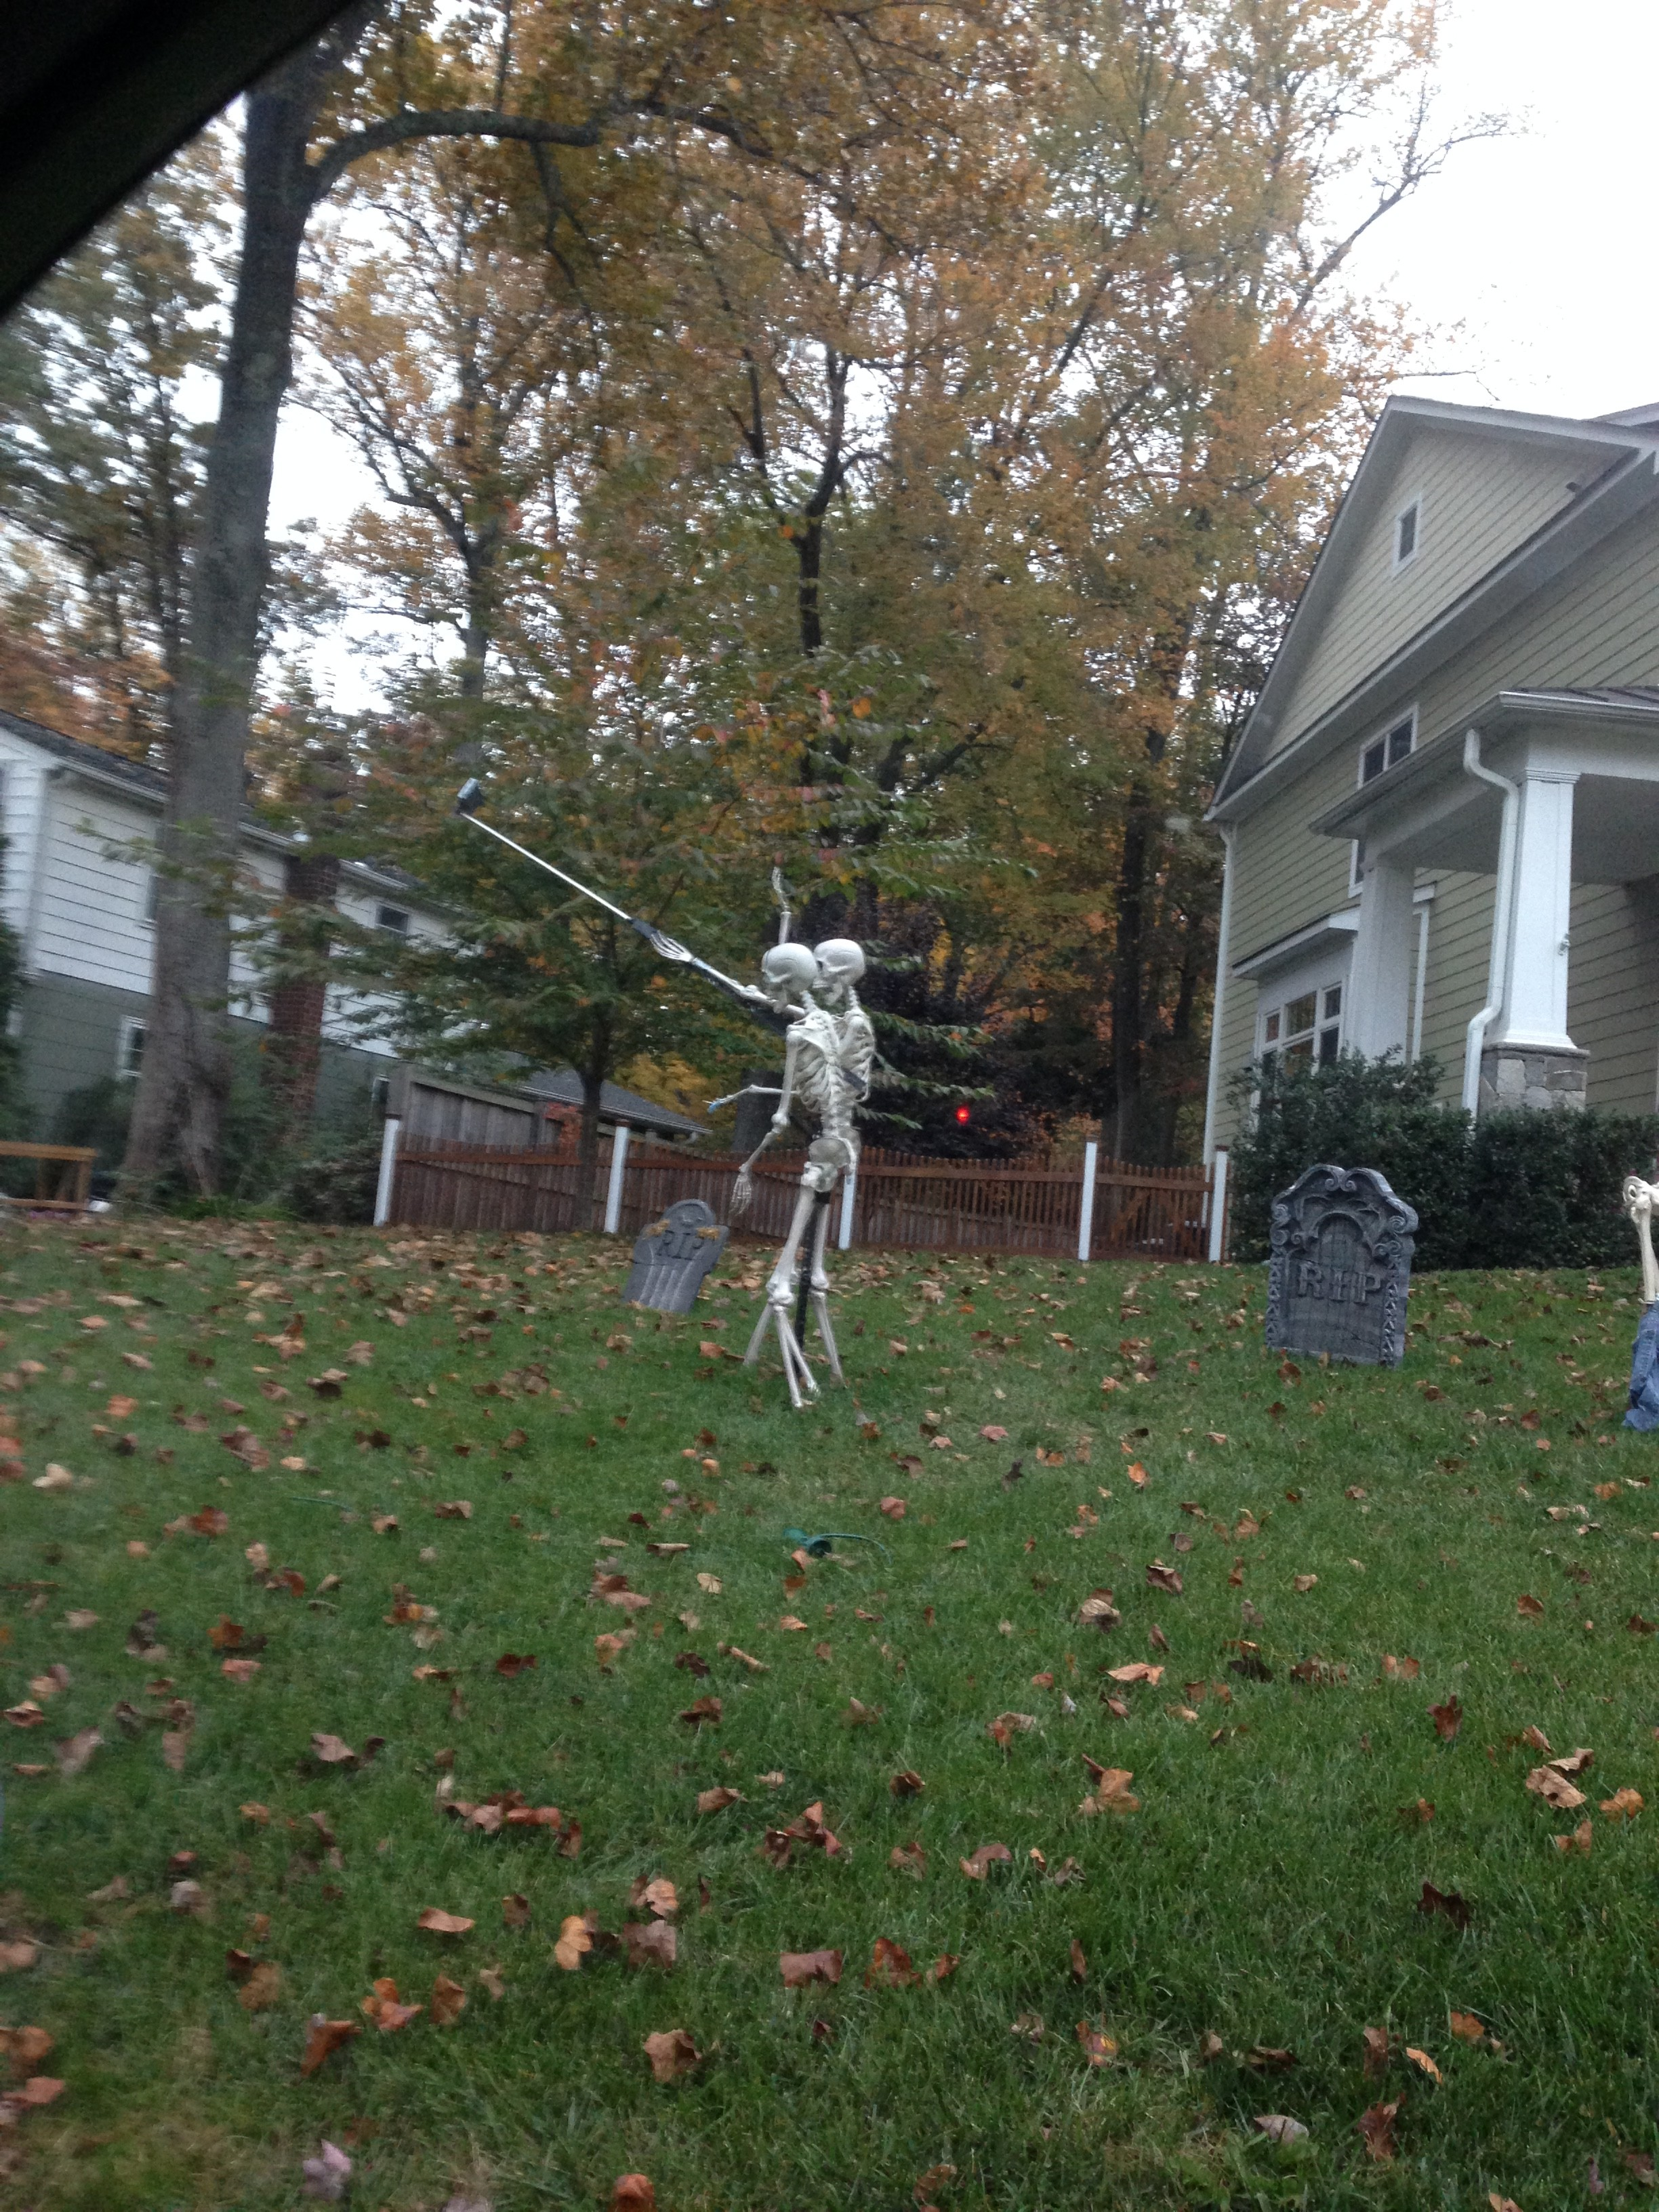 Funniest Halloween photo